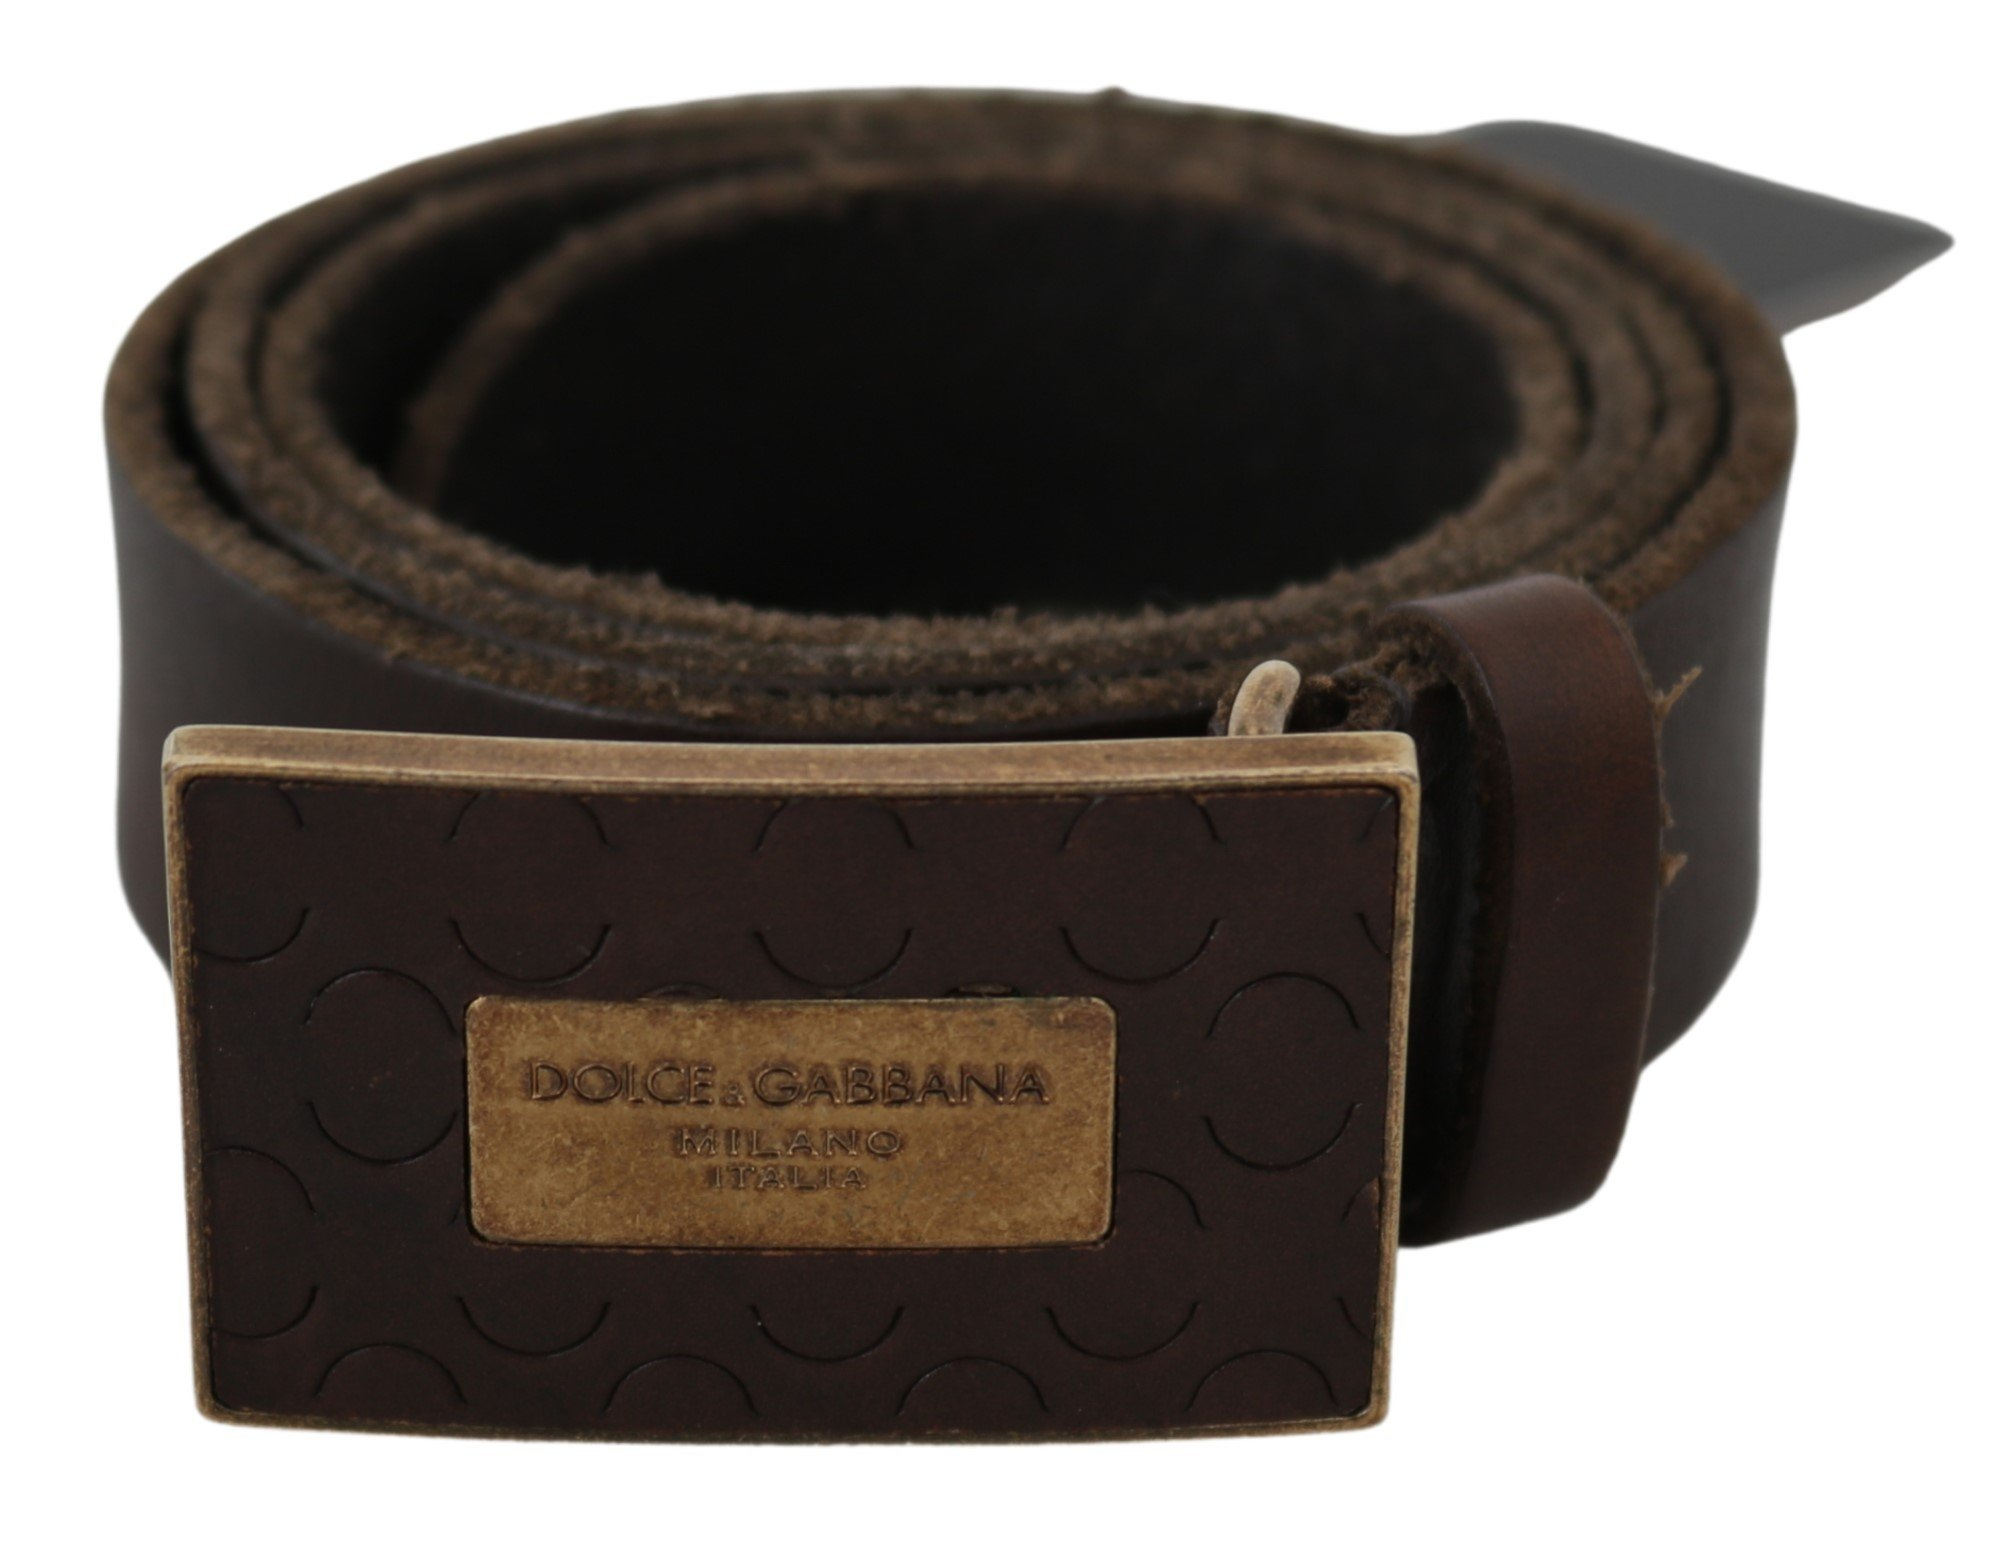 Dolce & Gabbana Men's Gold Logo Buckle Belt Brown BEL60799 - 80 cm / 32 Inches